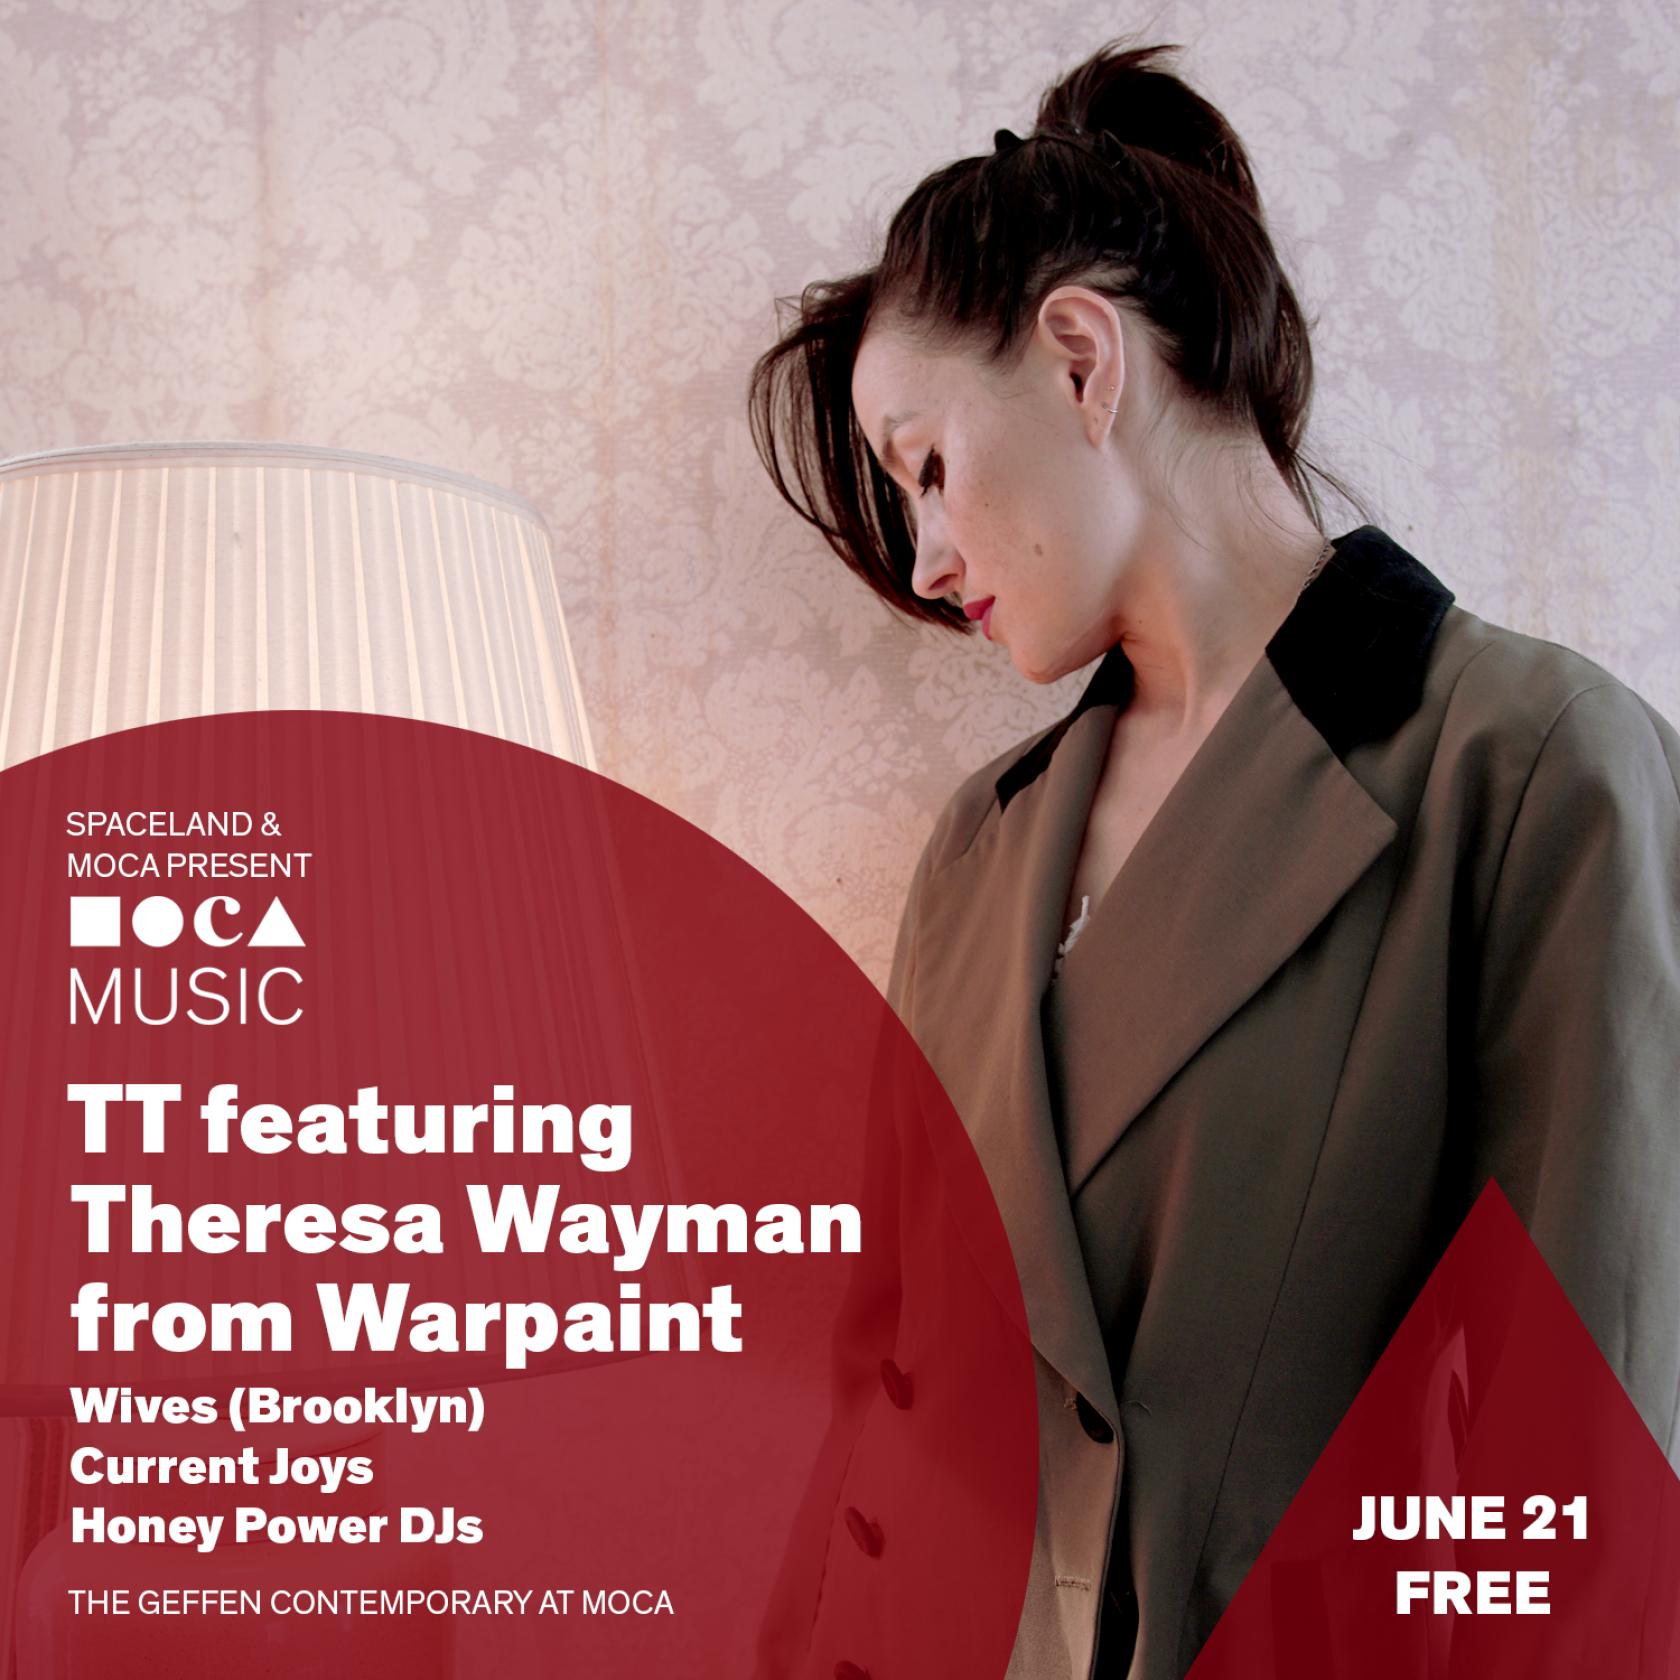 MOCA Music: TT featuring Theresa Wayman from Warpaint, WIVES (Brooklyn), Current Joys, and Honey Power DJS!